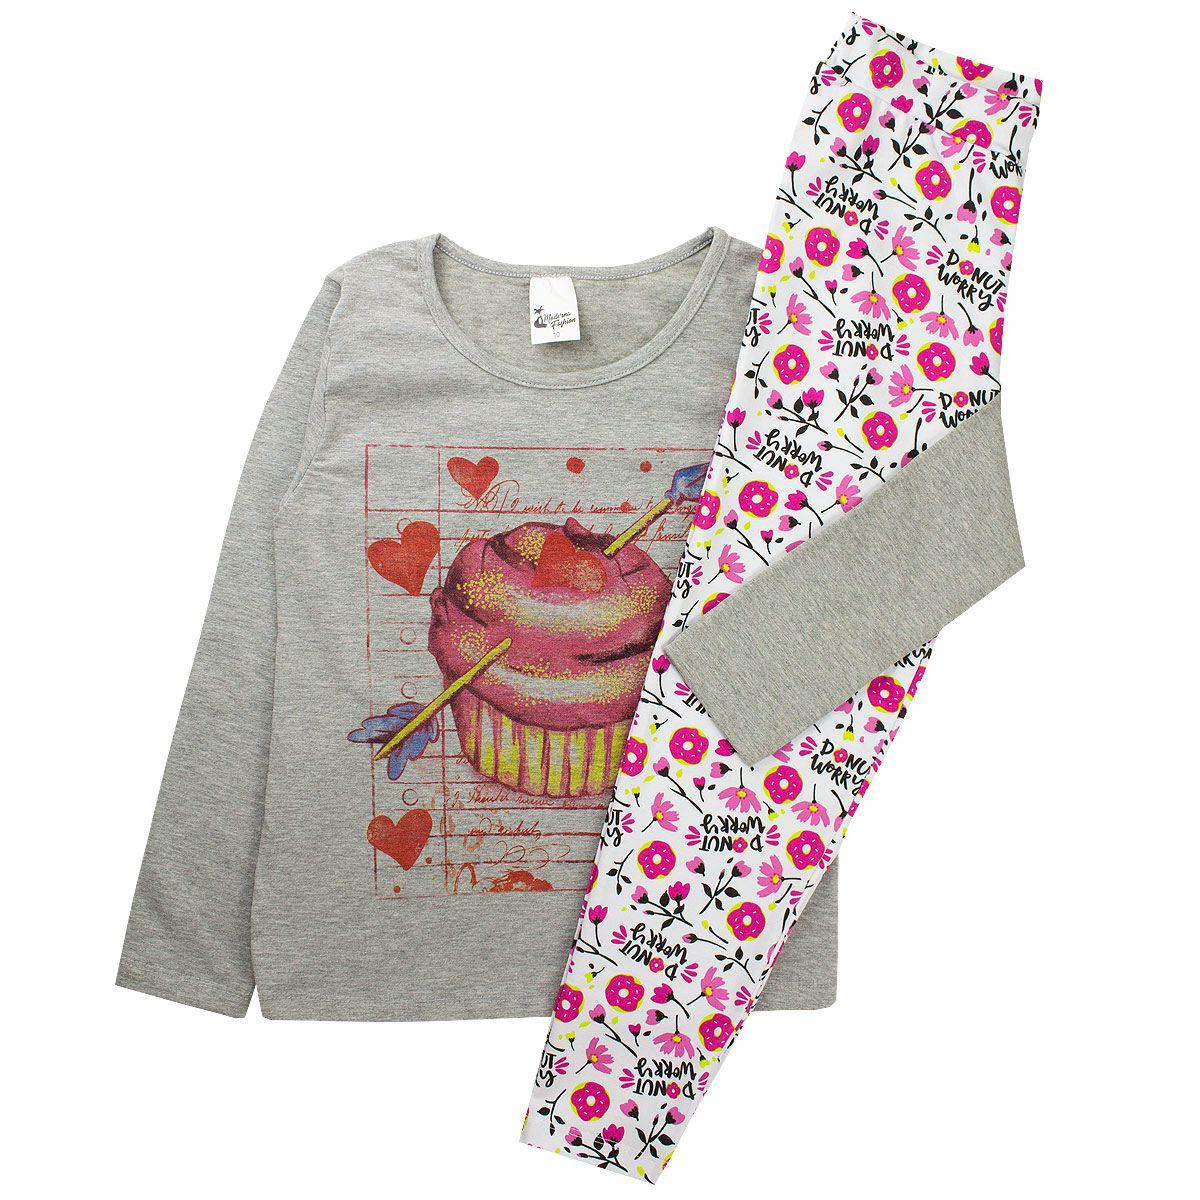 Kit 5 Conjuntos Infantil Feminino Cotton Roupas Menina